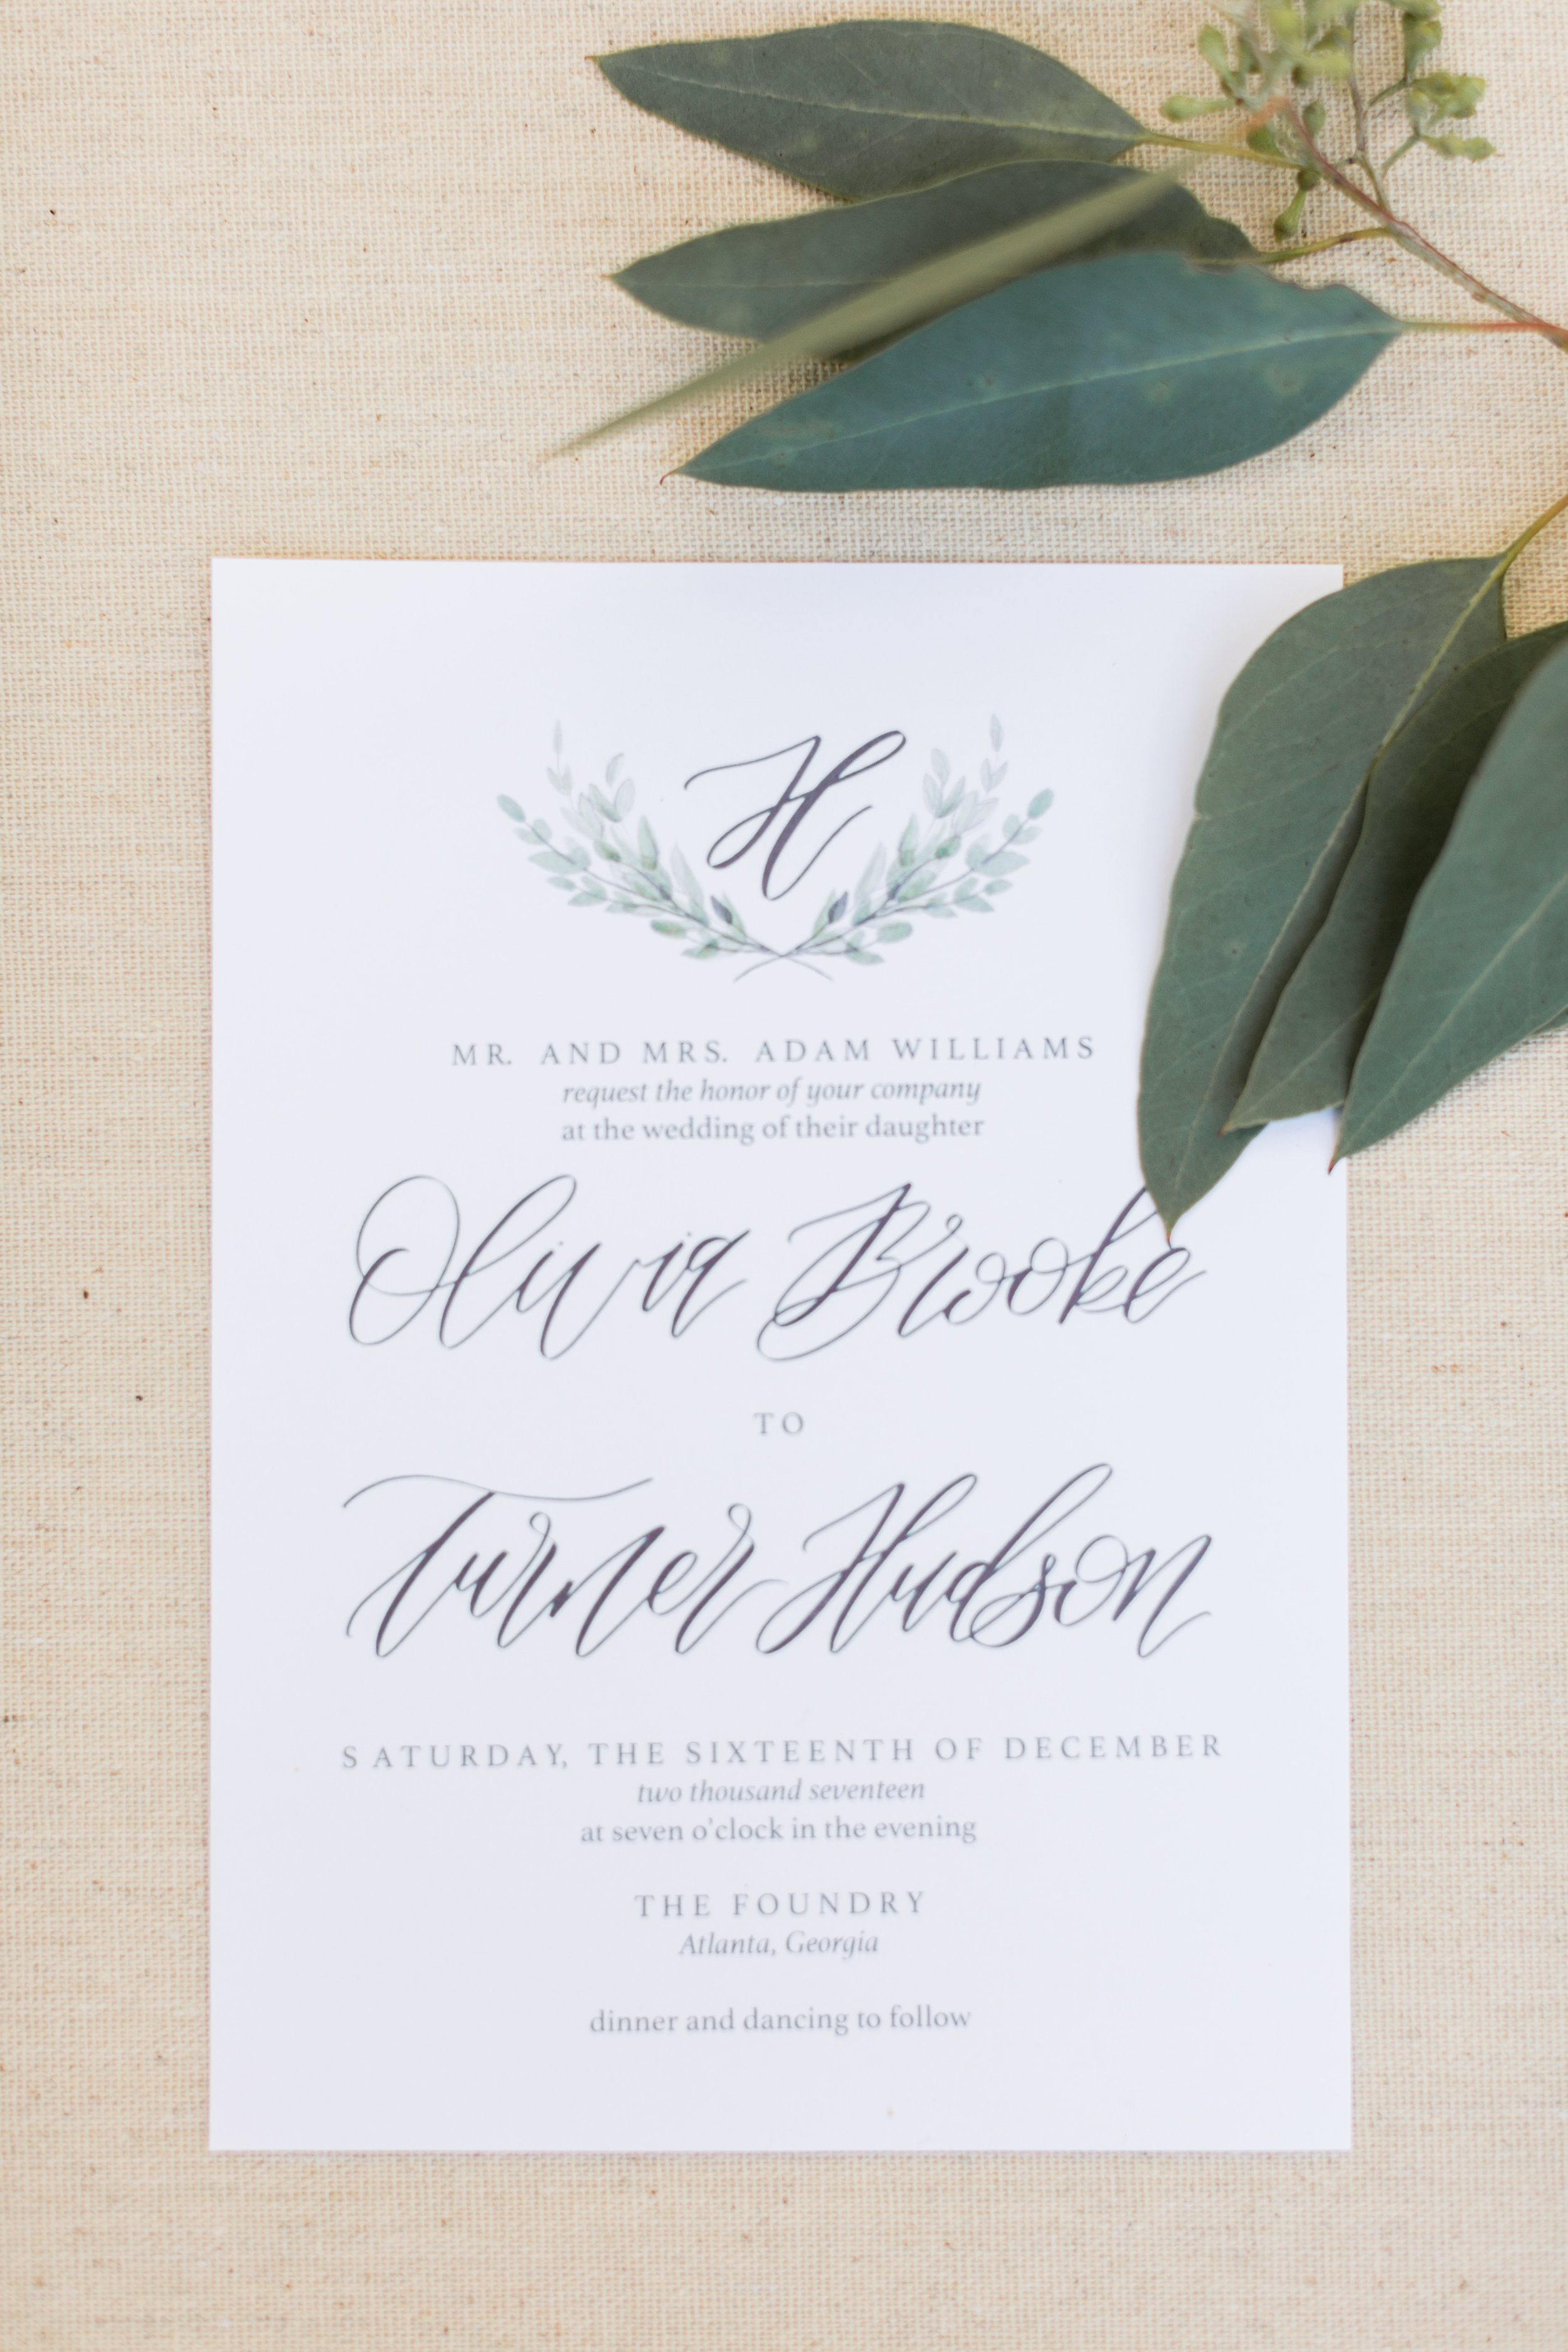 gracefullymade-wedding-invitation-wording-greenwreath.jpg